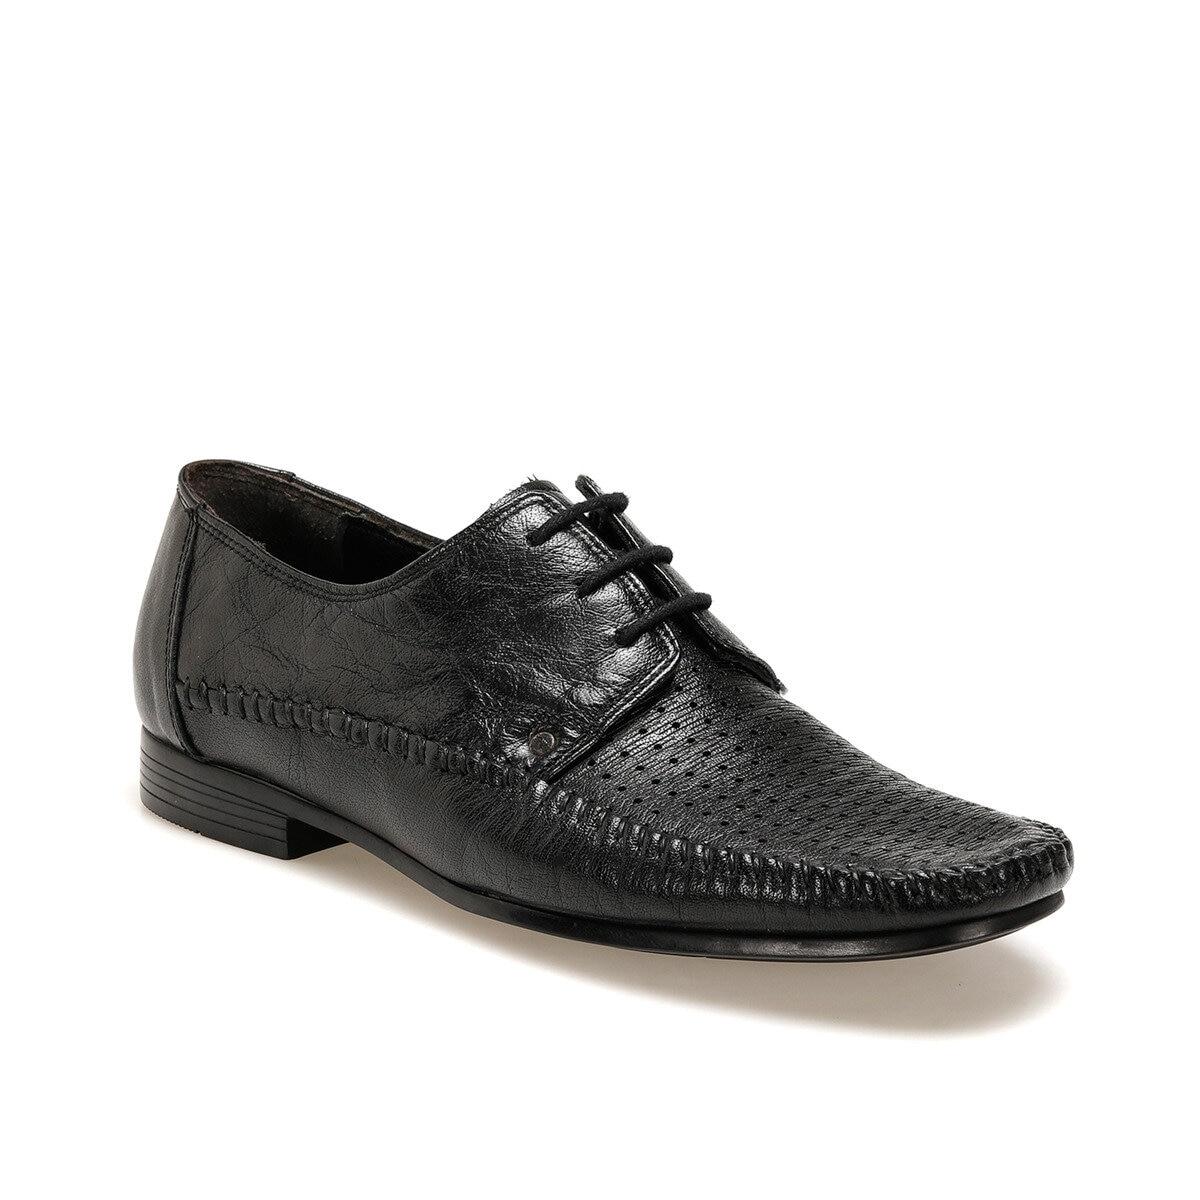 FLO 125 Black Men Dress Shoes Garamond